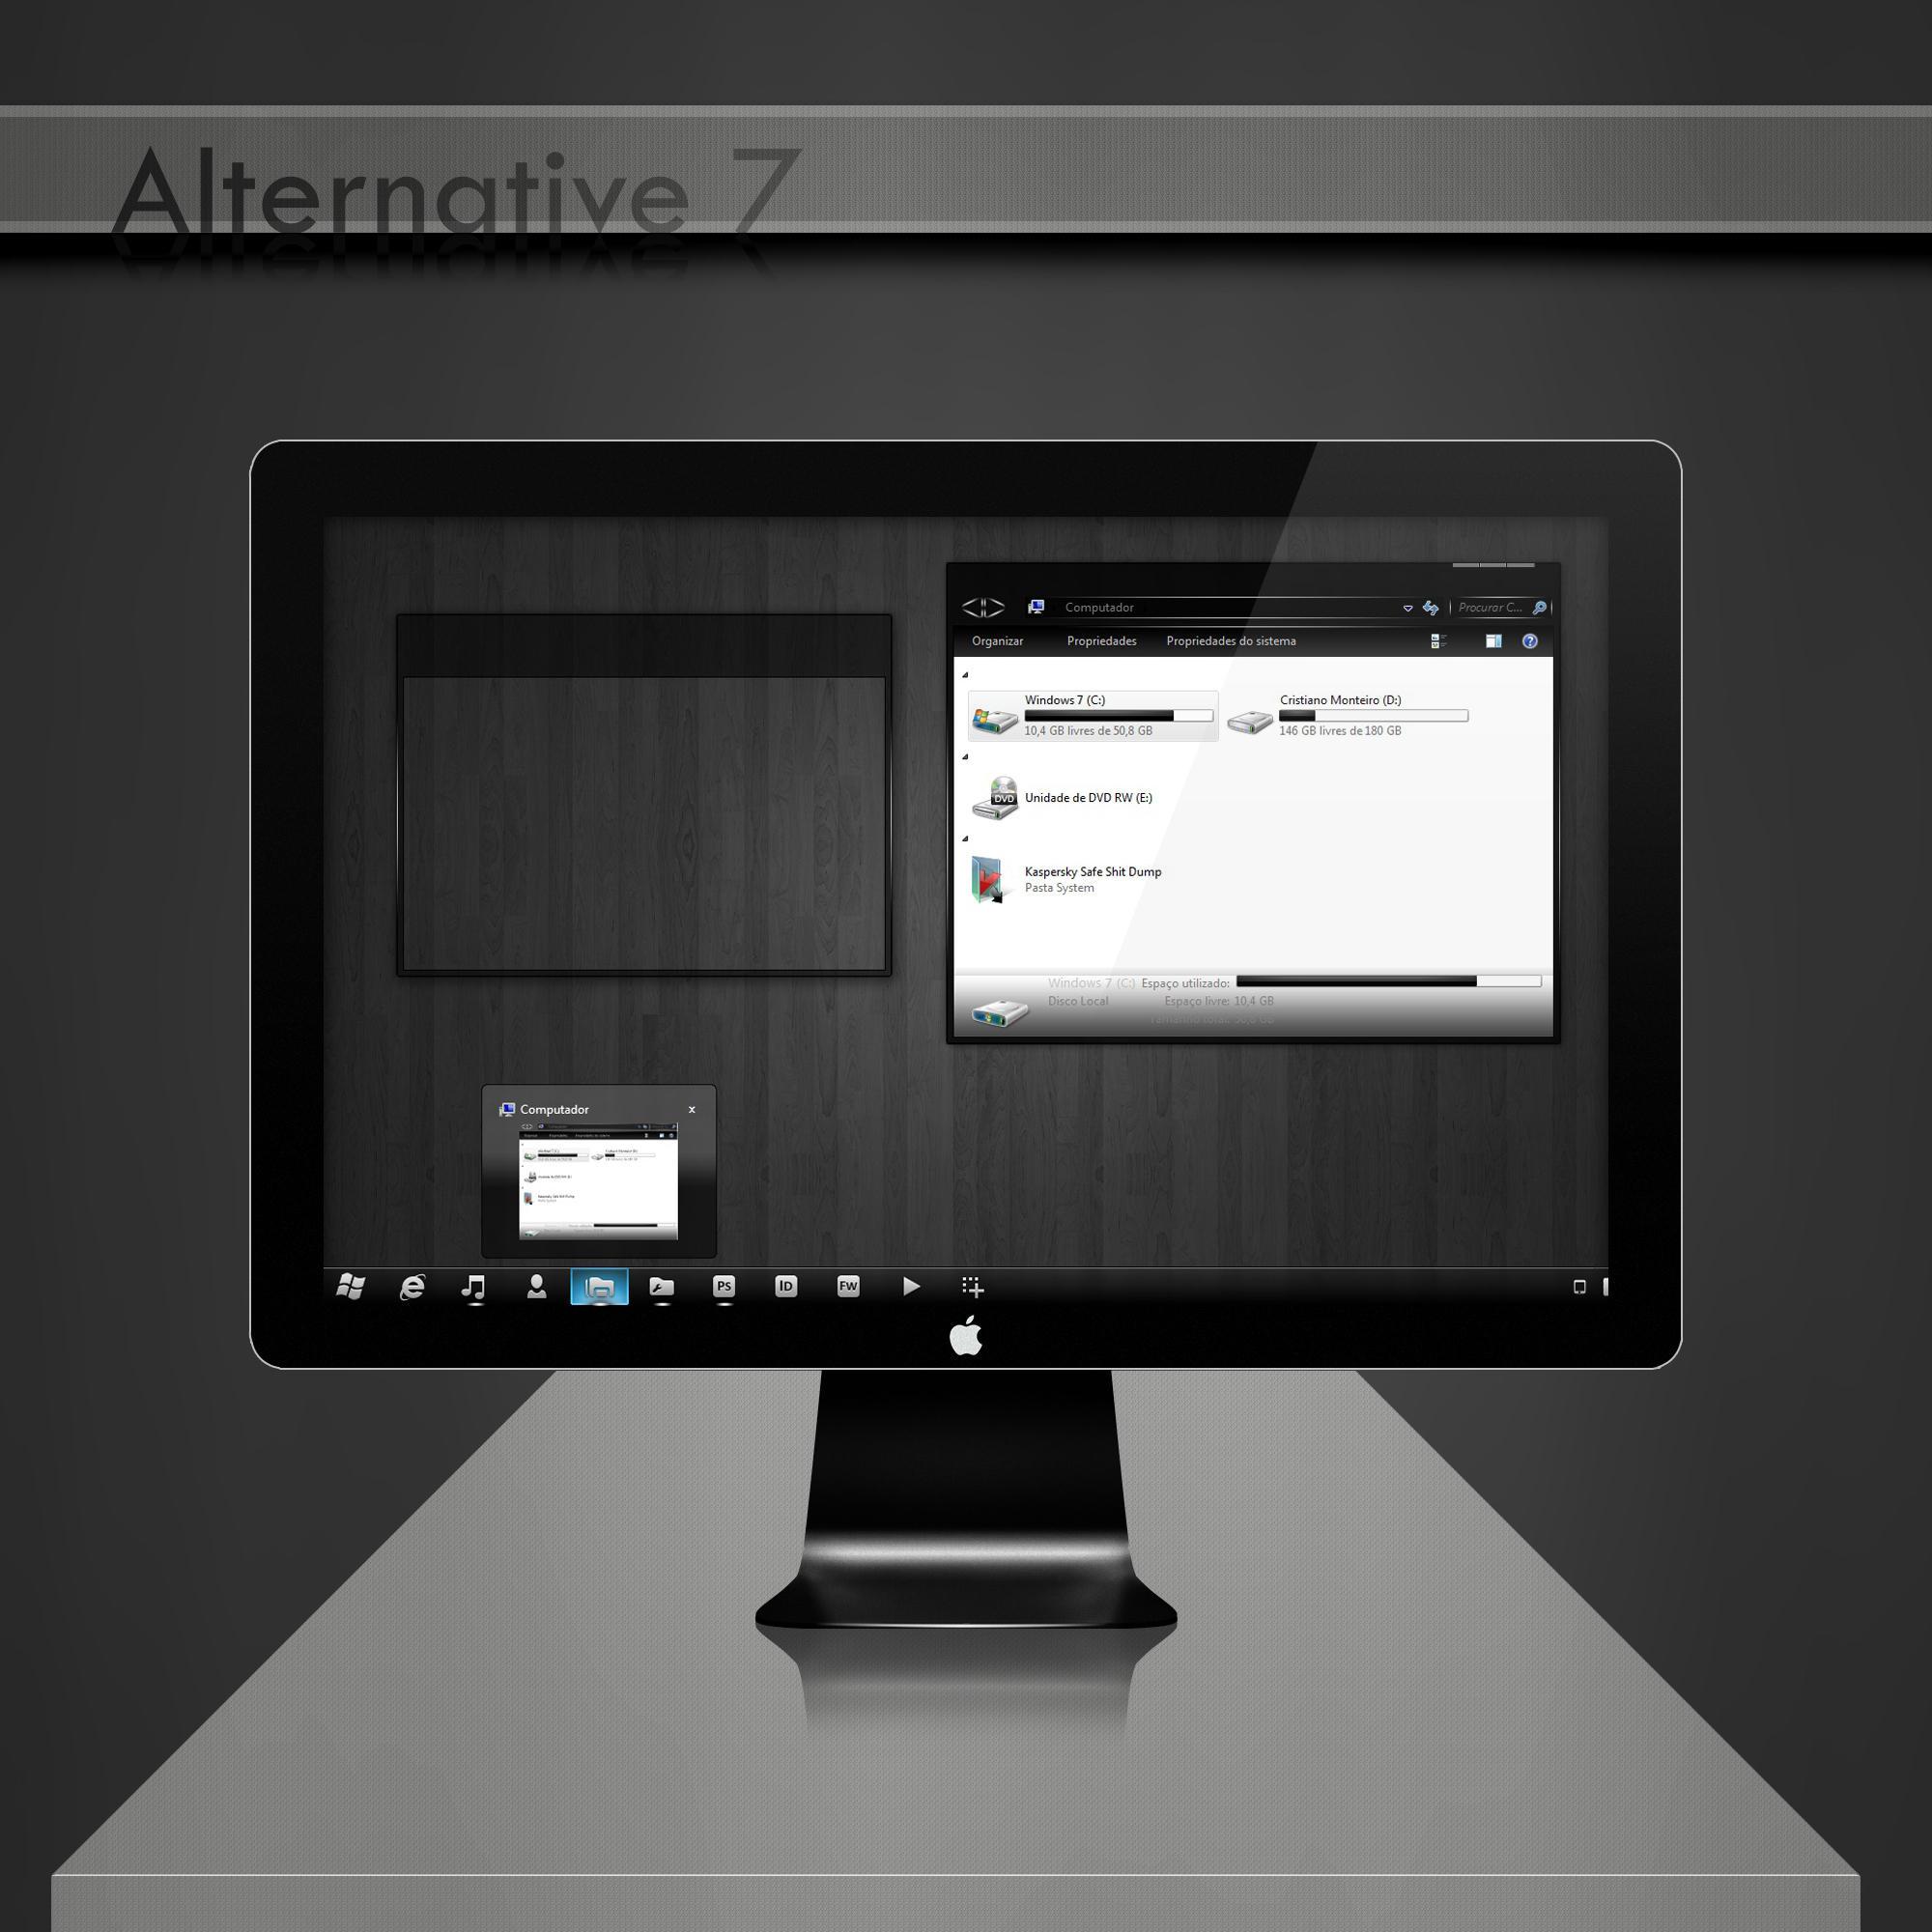 Windows 7 Alternative by InCris